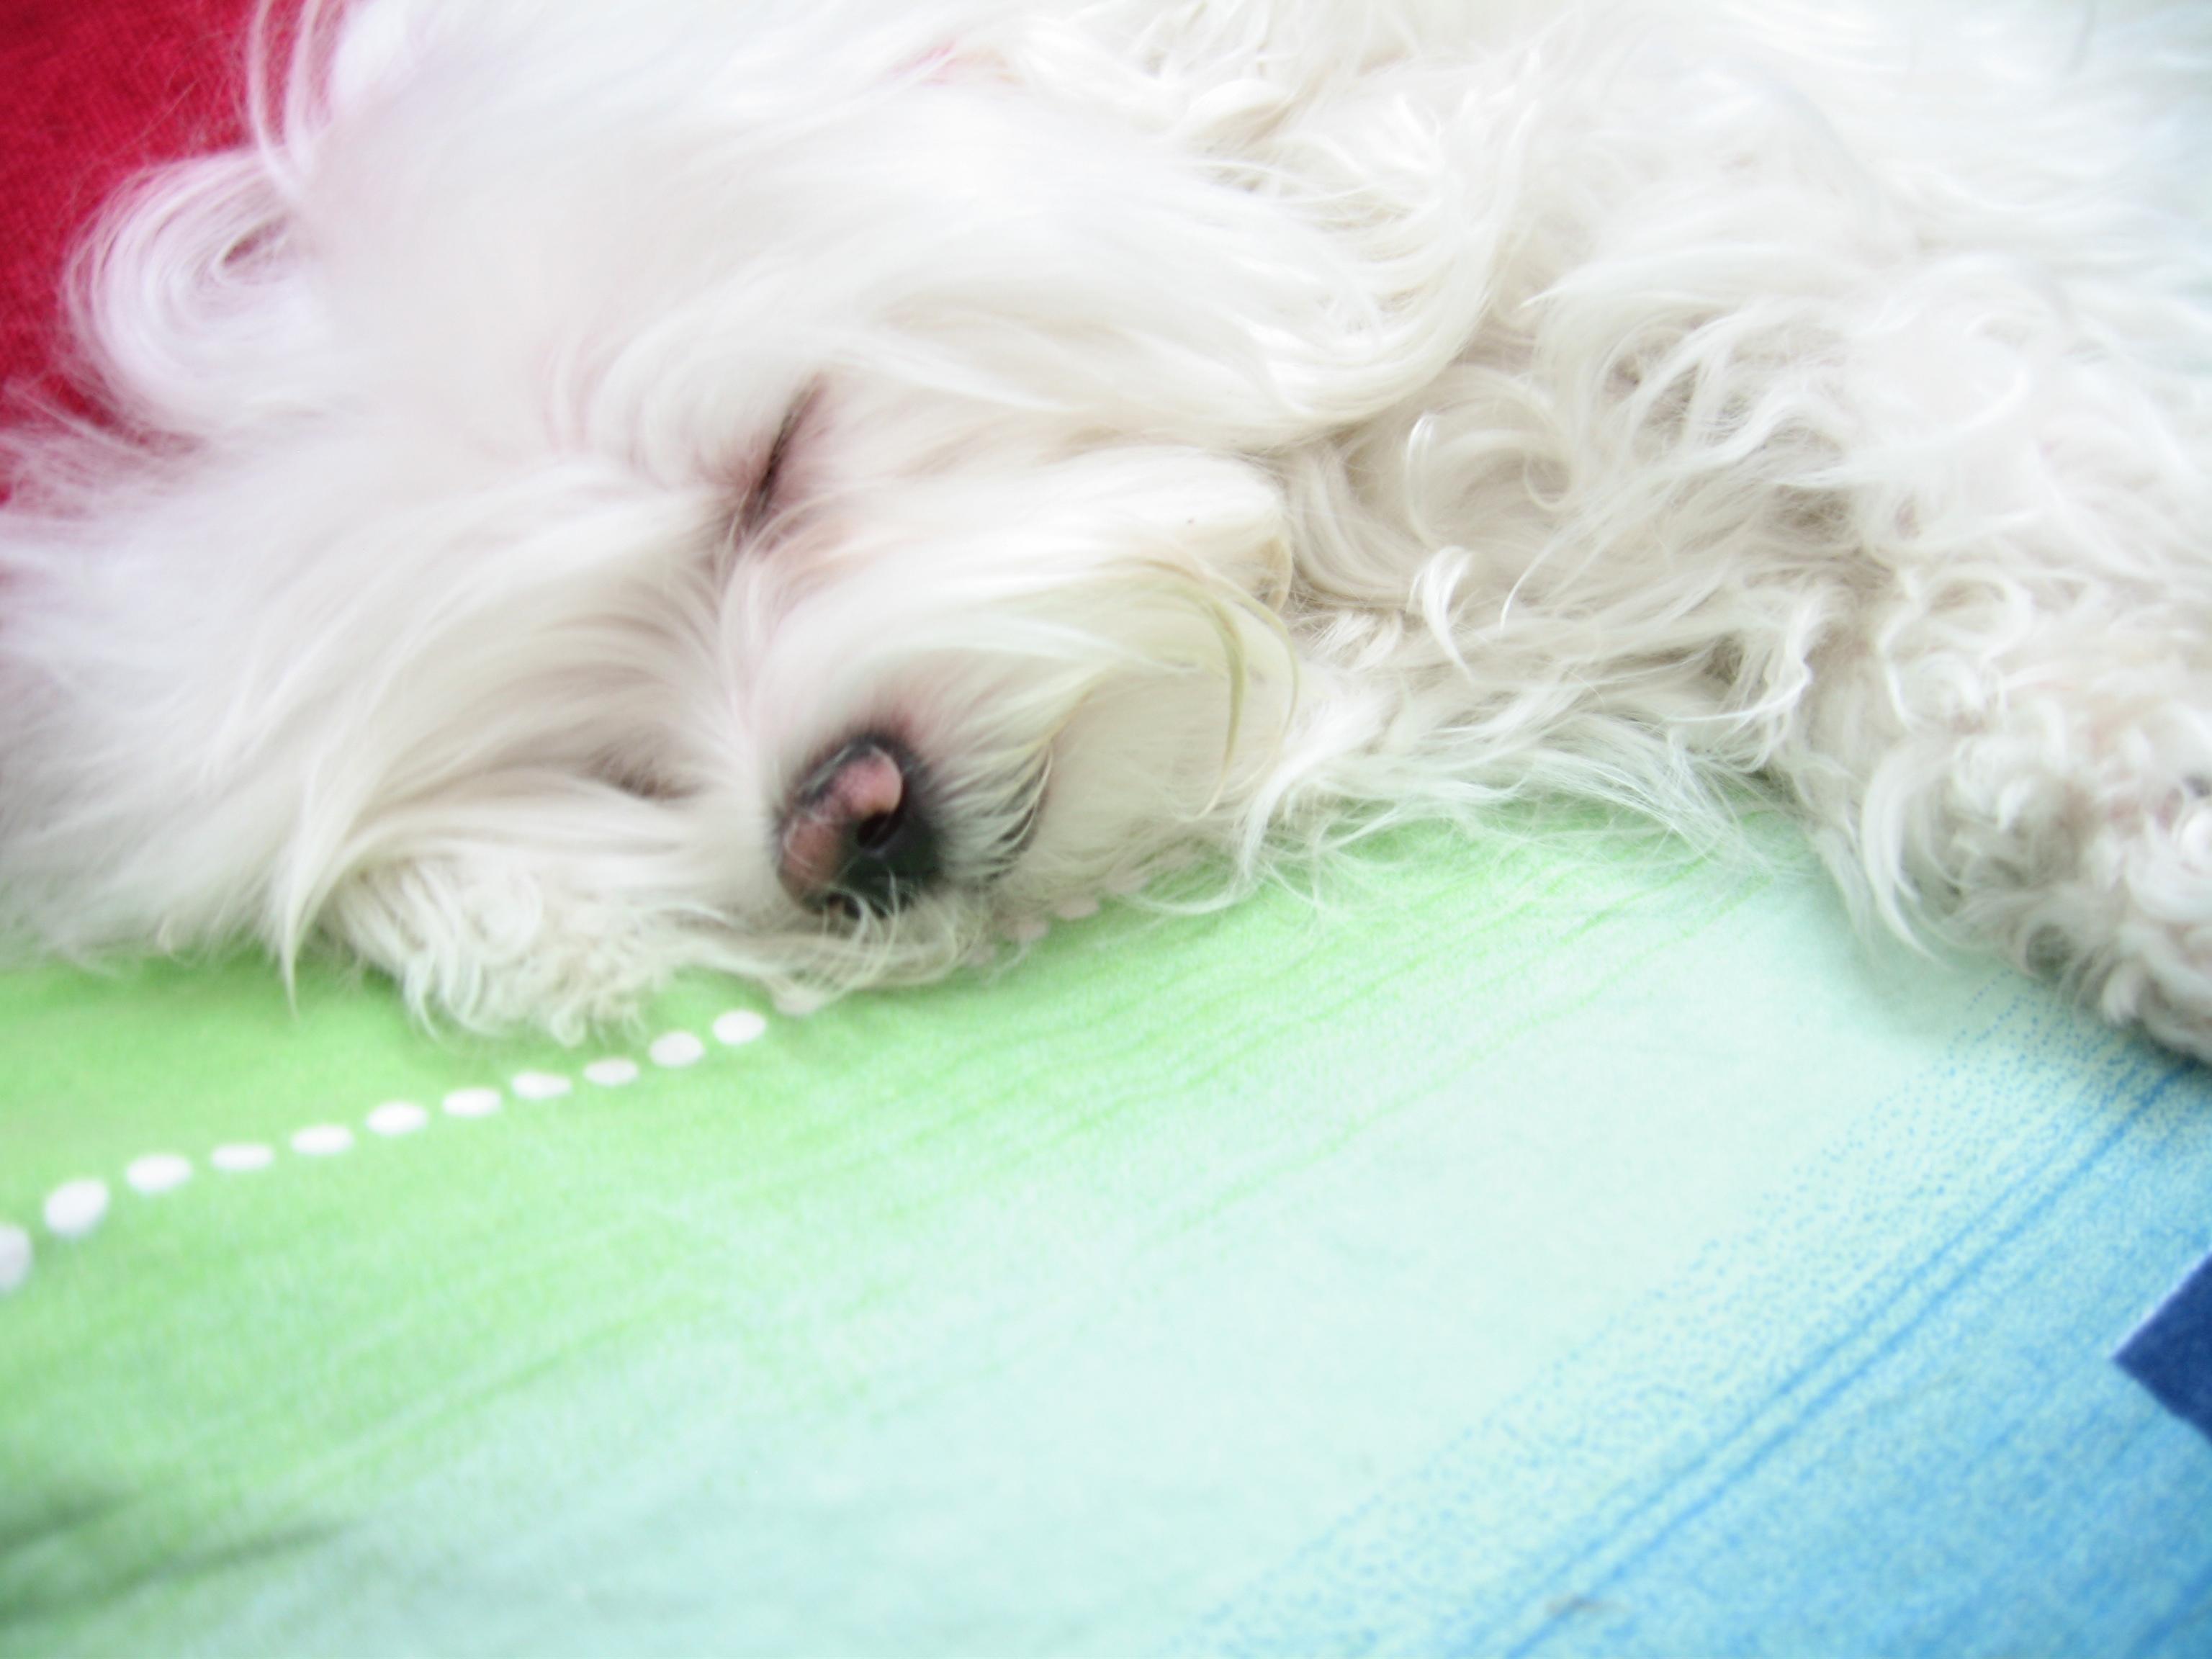 File:Maltese dog named Pofak.jpg - Wikimedia Commons